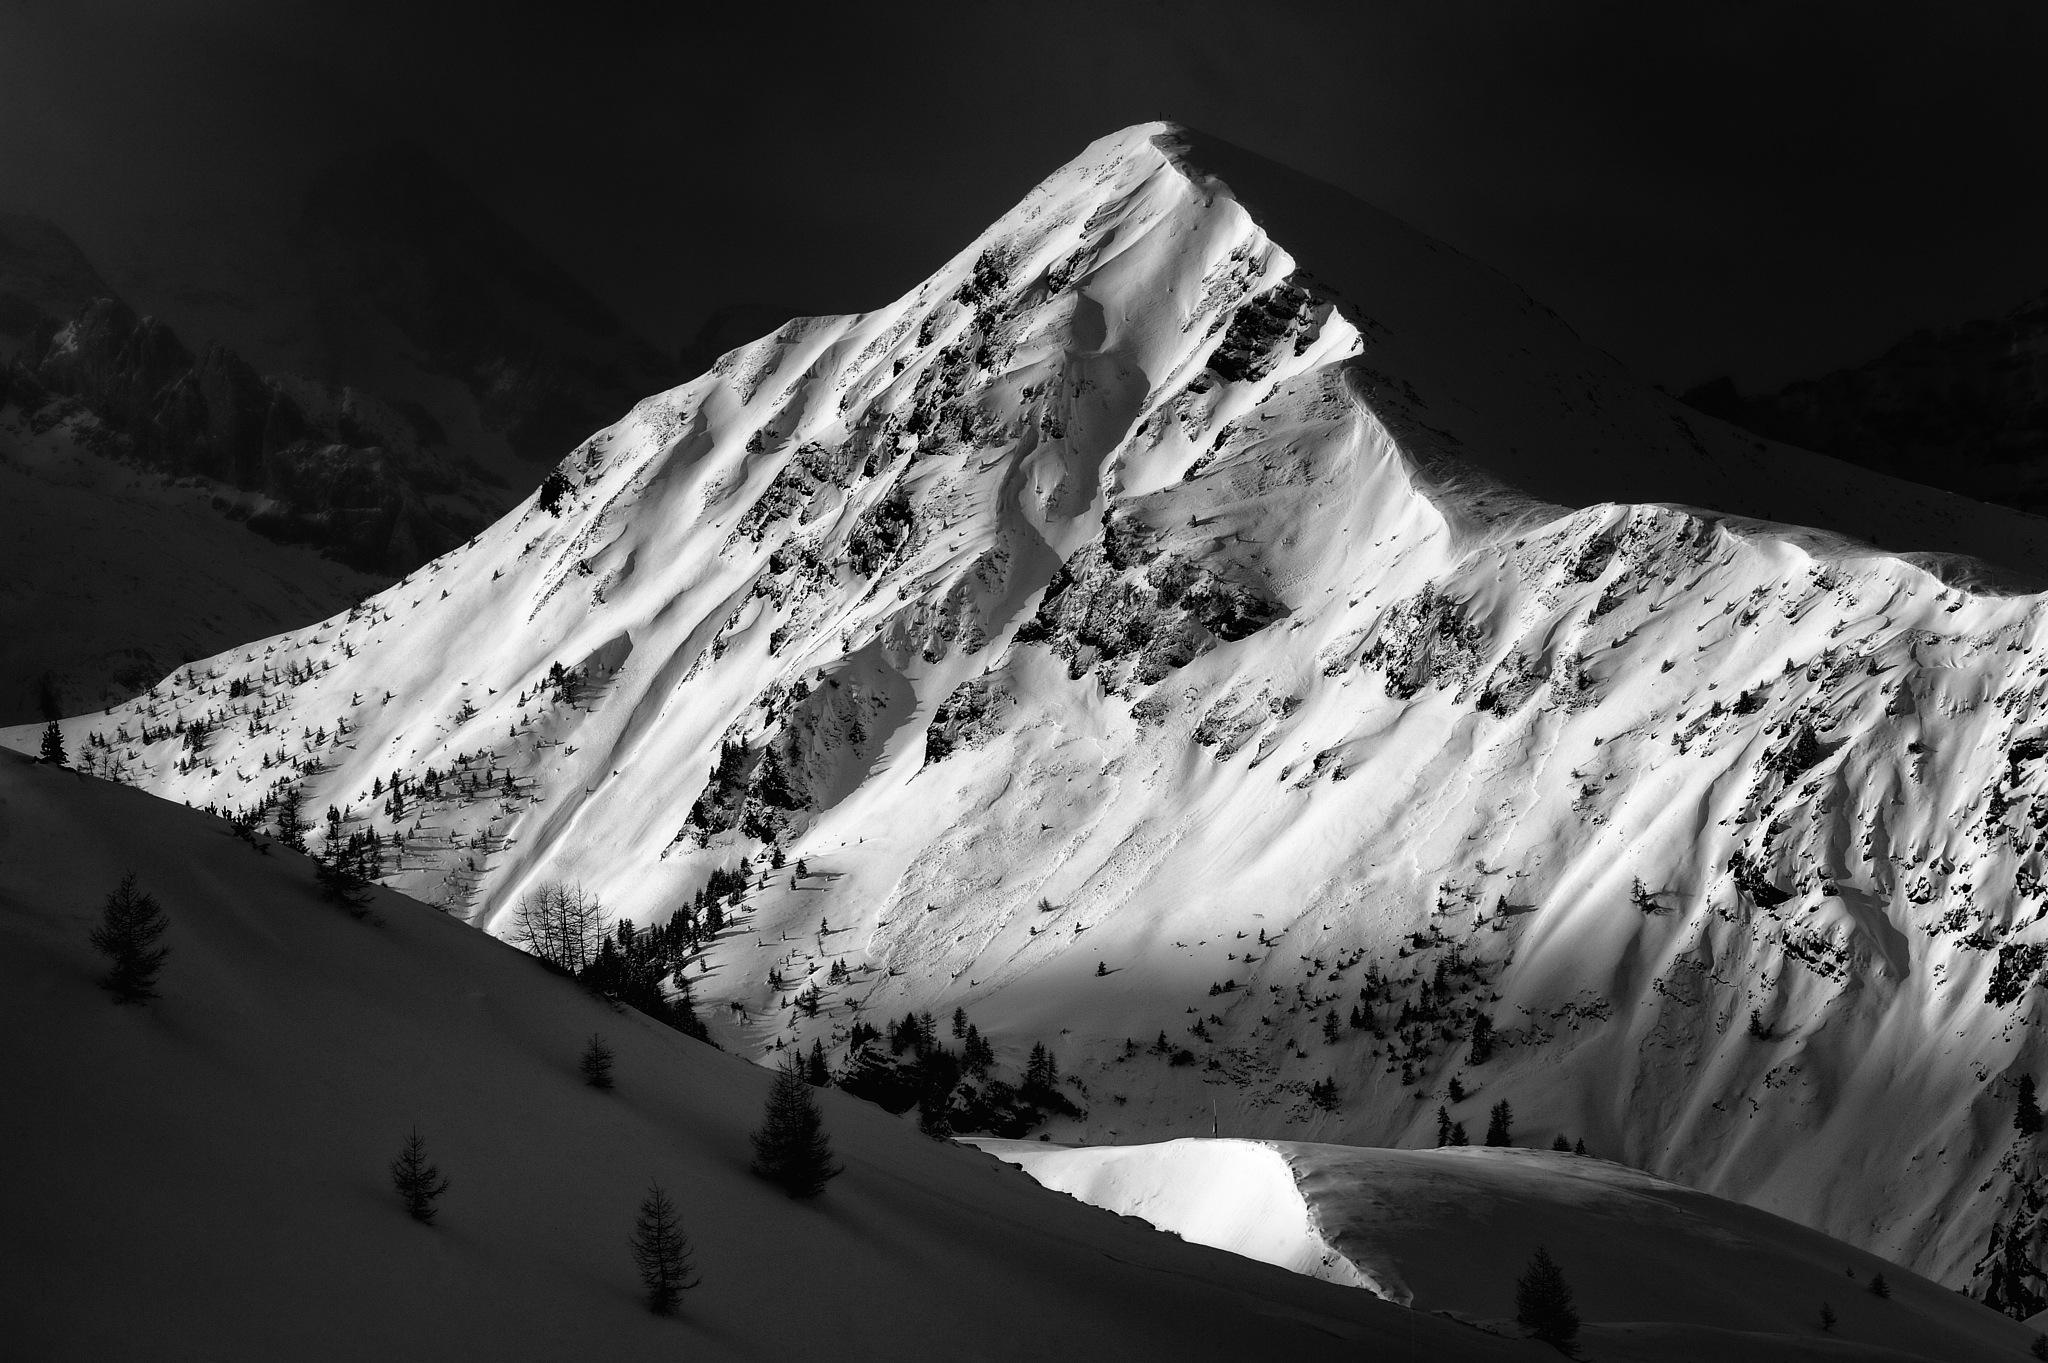 Snowy Top by Anna Pagnacco